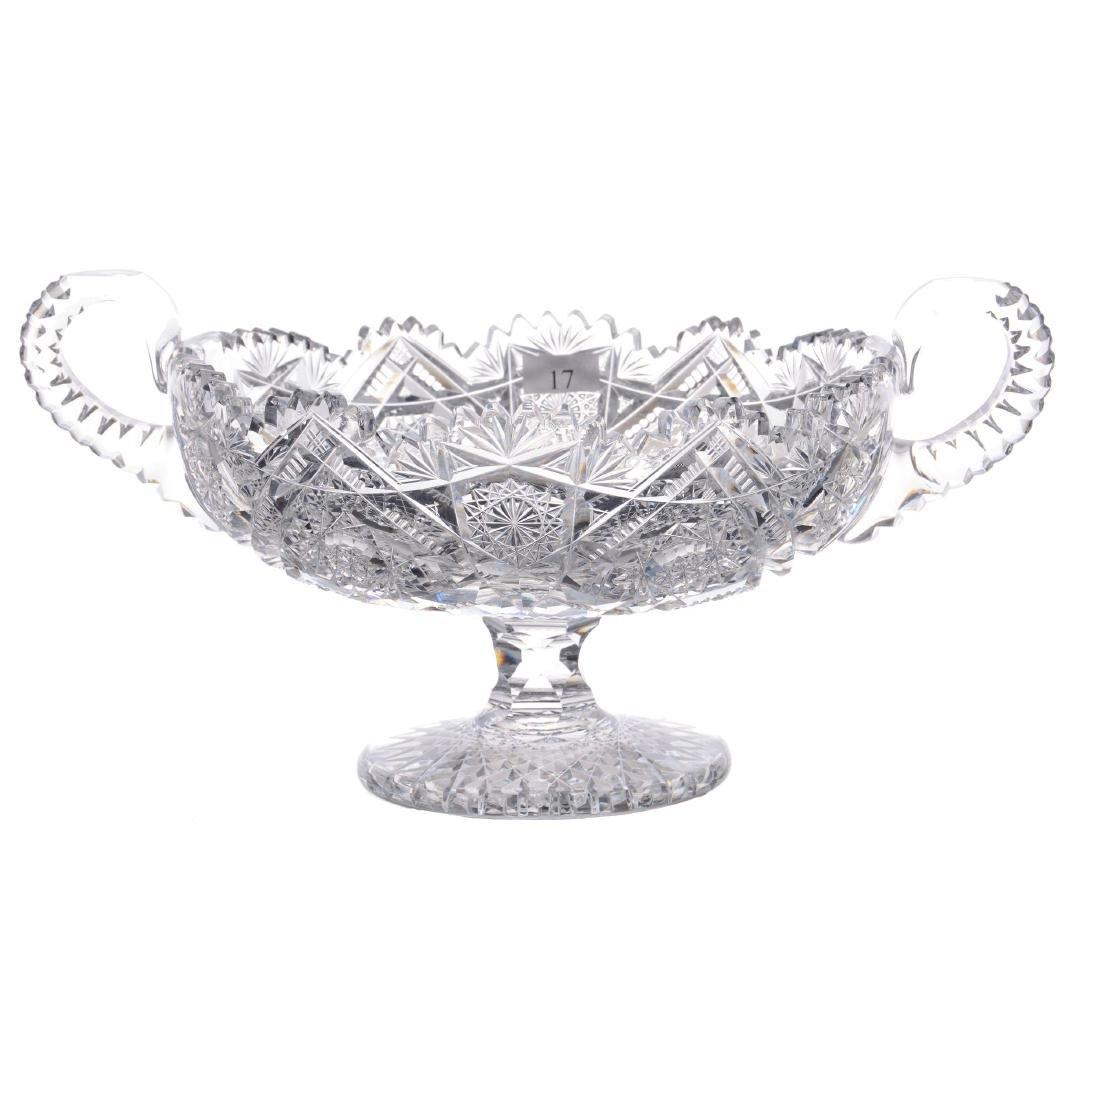 "Two-Handled Pedestal Fruit Bowl - 5.75"" X 12"" (Across H"